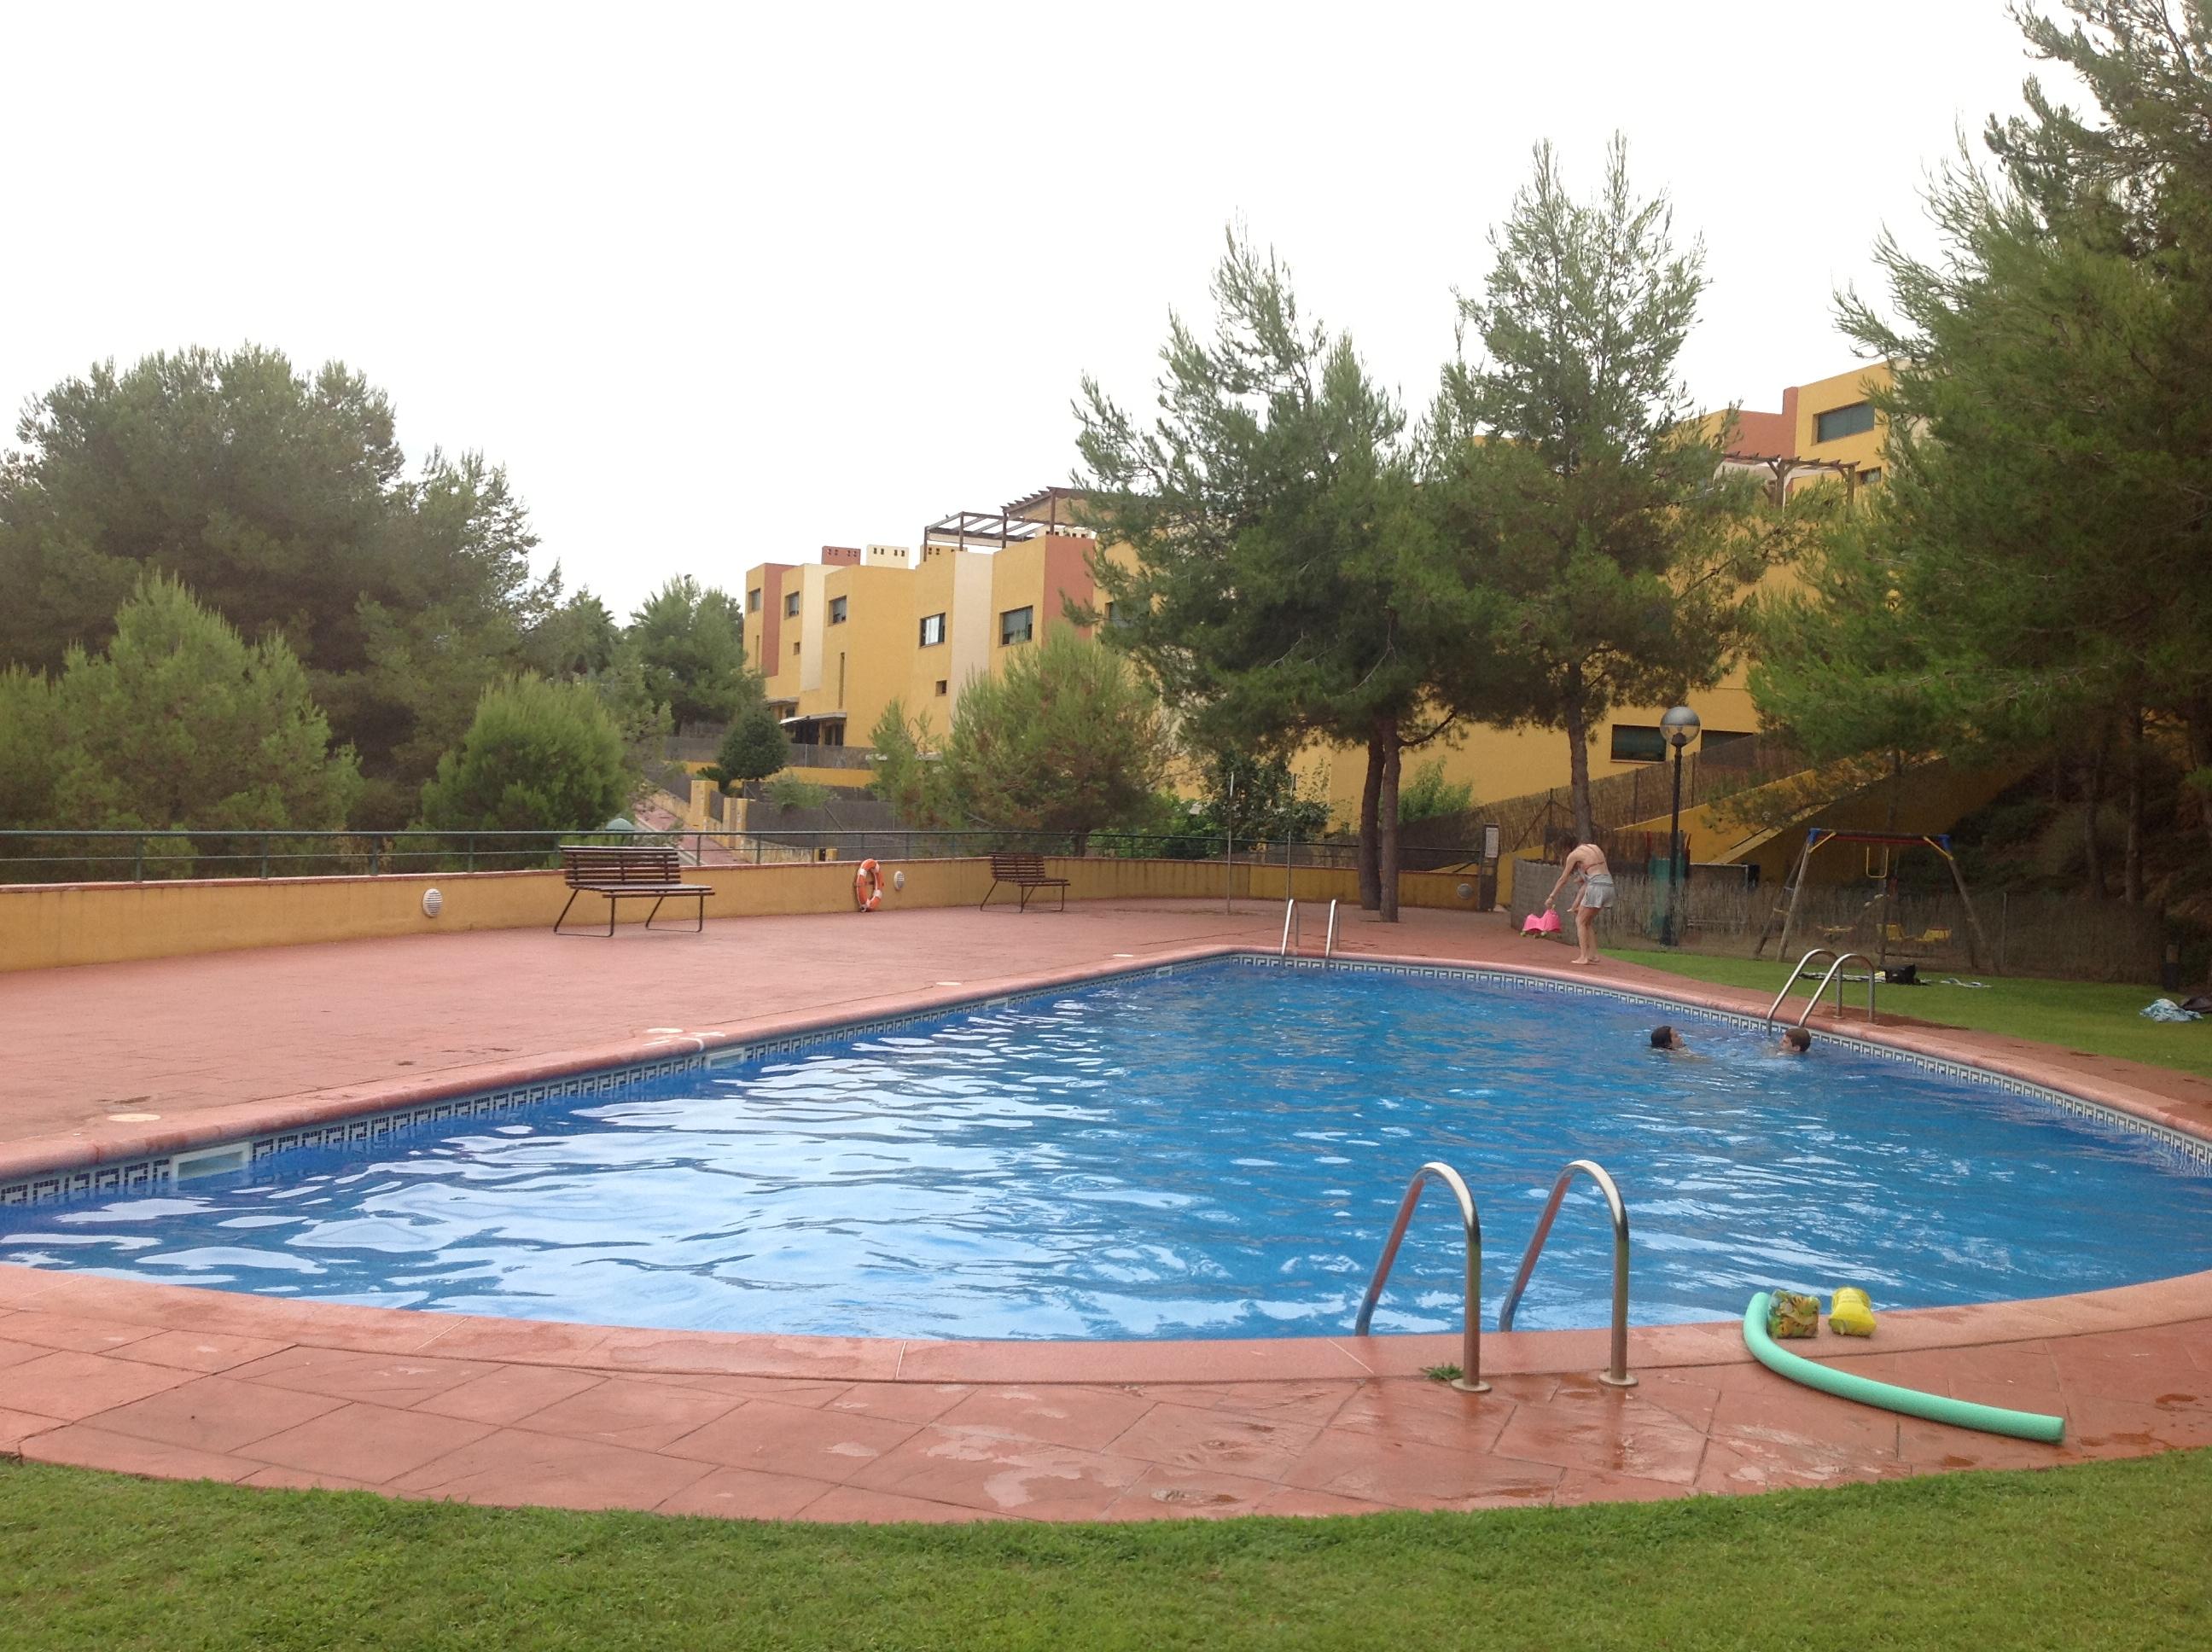 Таунхаус в Таррагона - Коста Дорада, площадь 100 м², 3 спальни